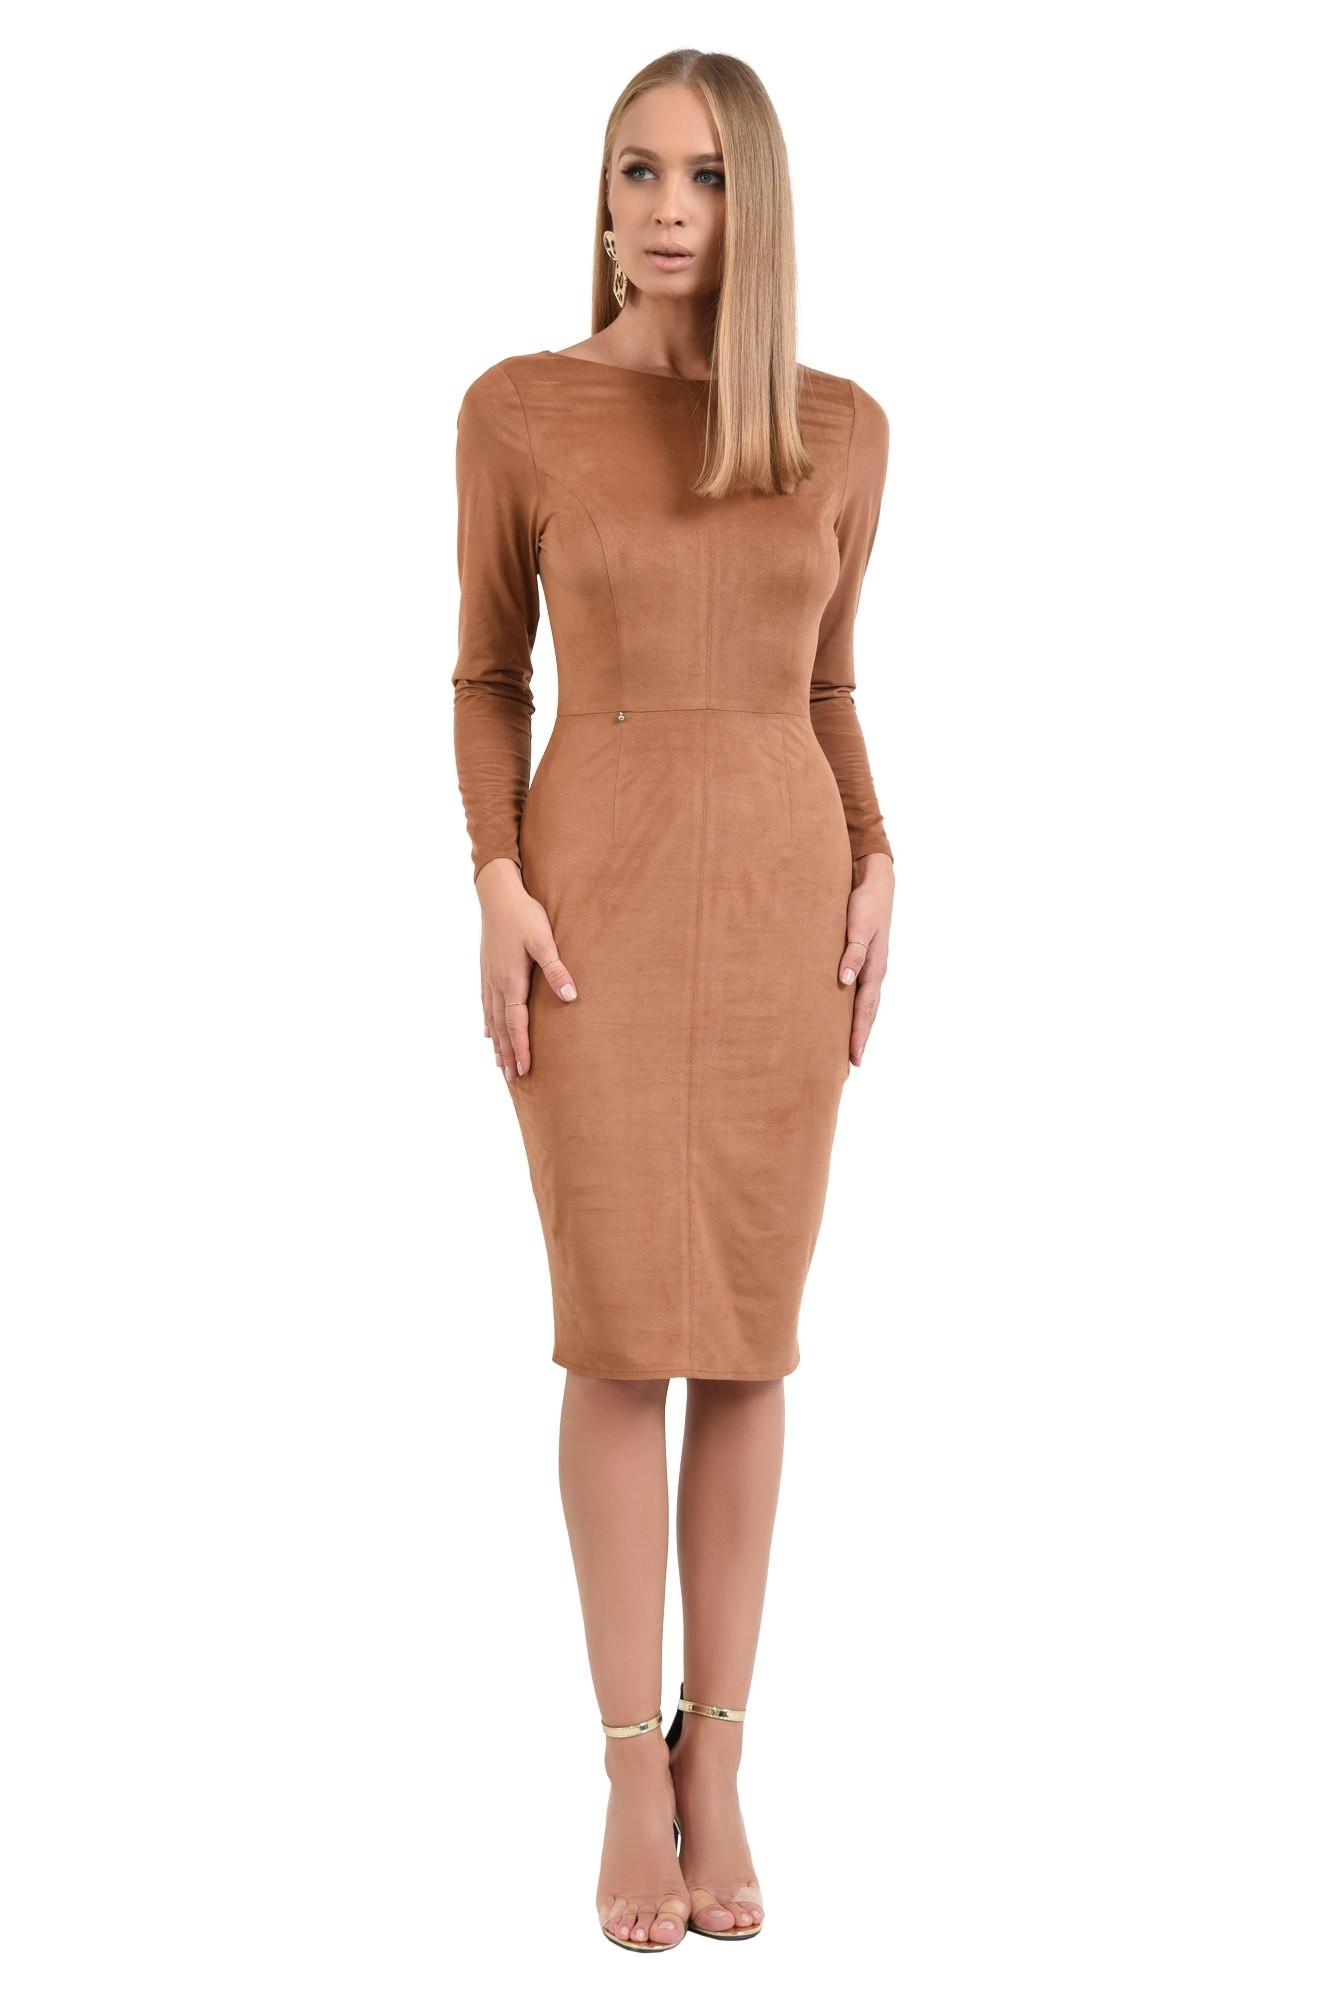 3 - 360 - rochie eleganta, piele intoarsa eco, maro